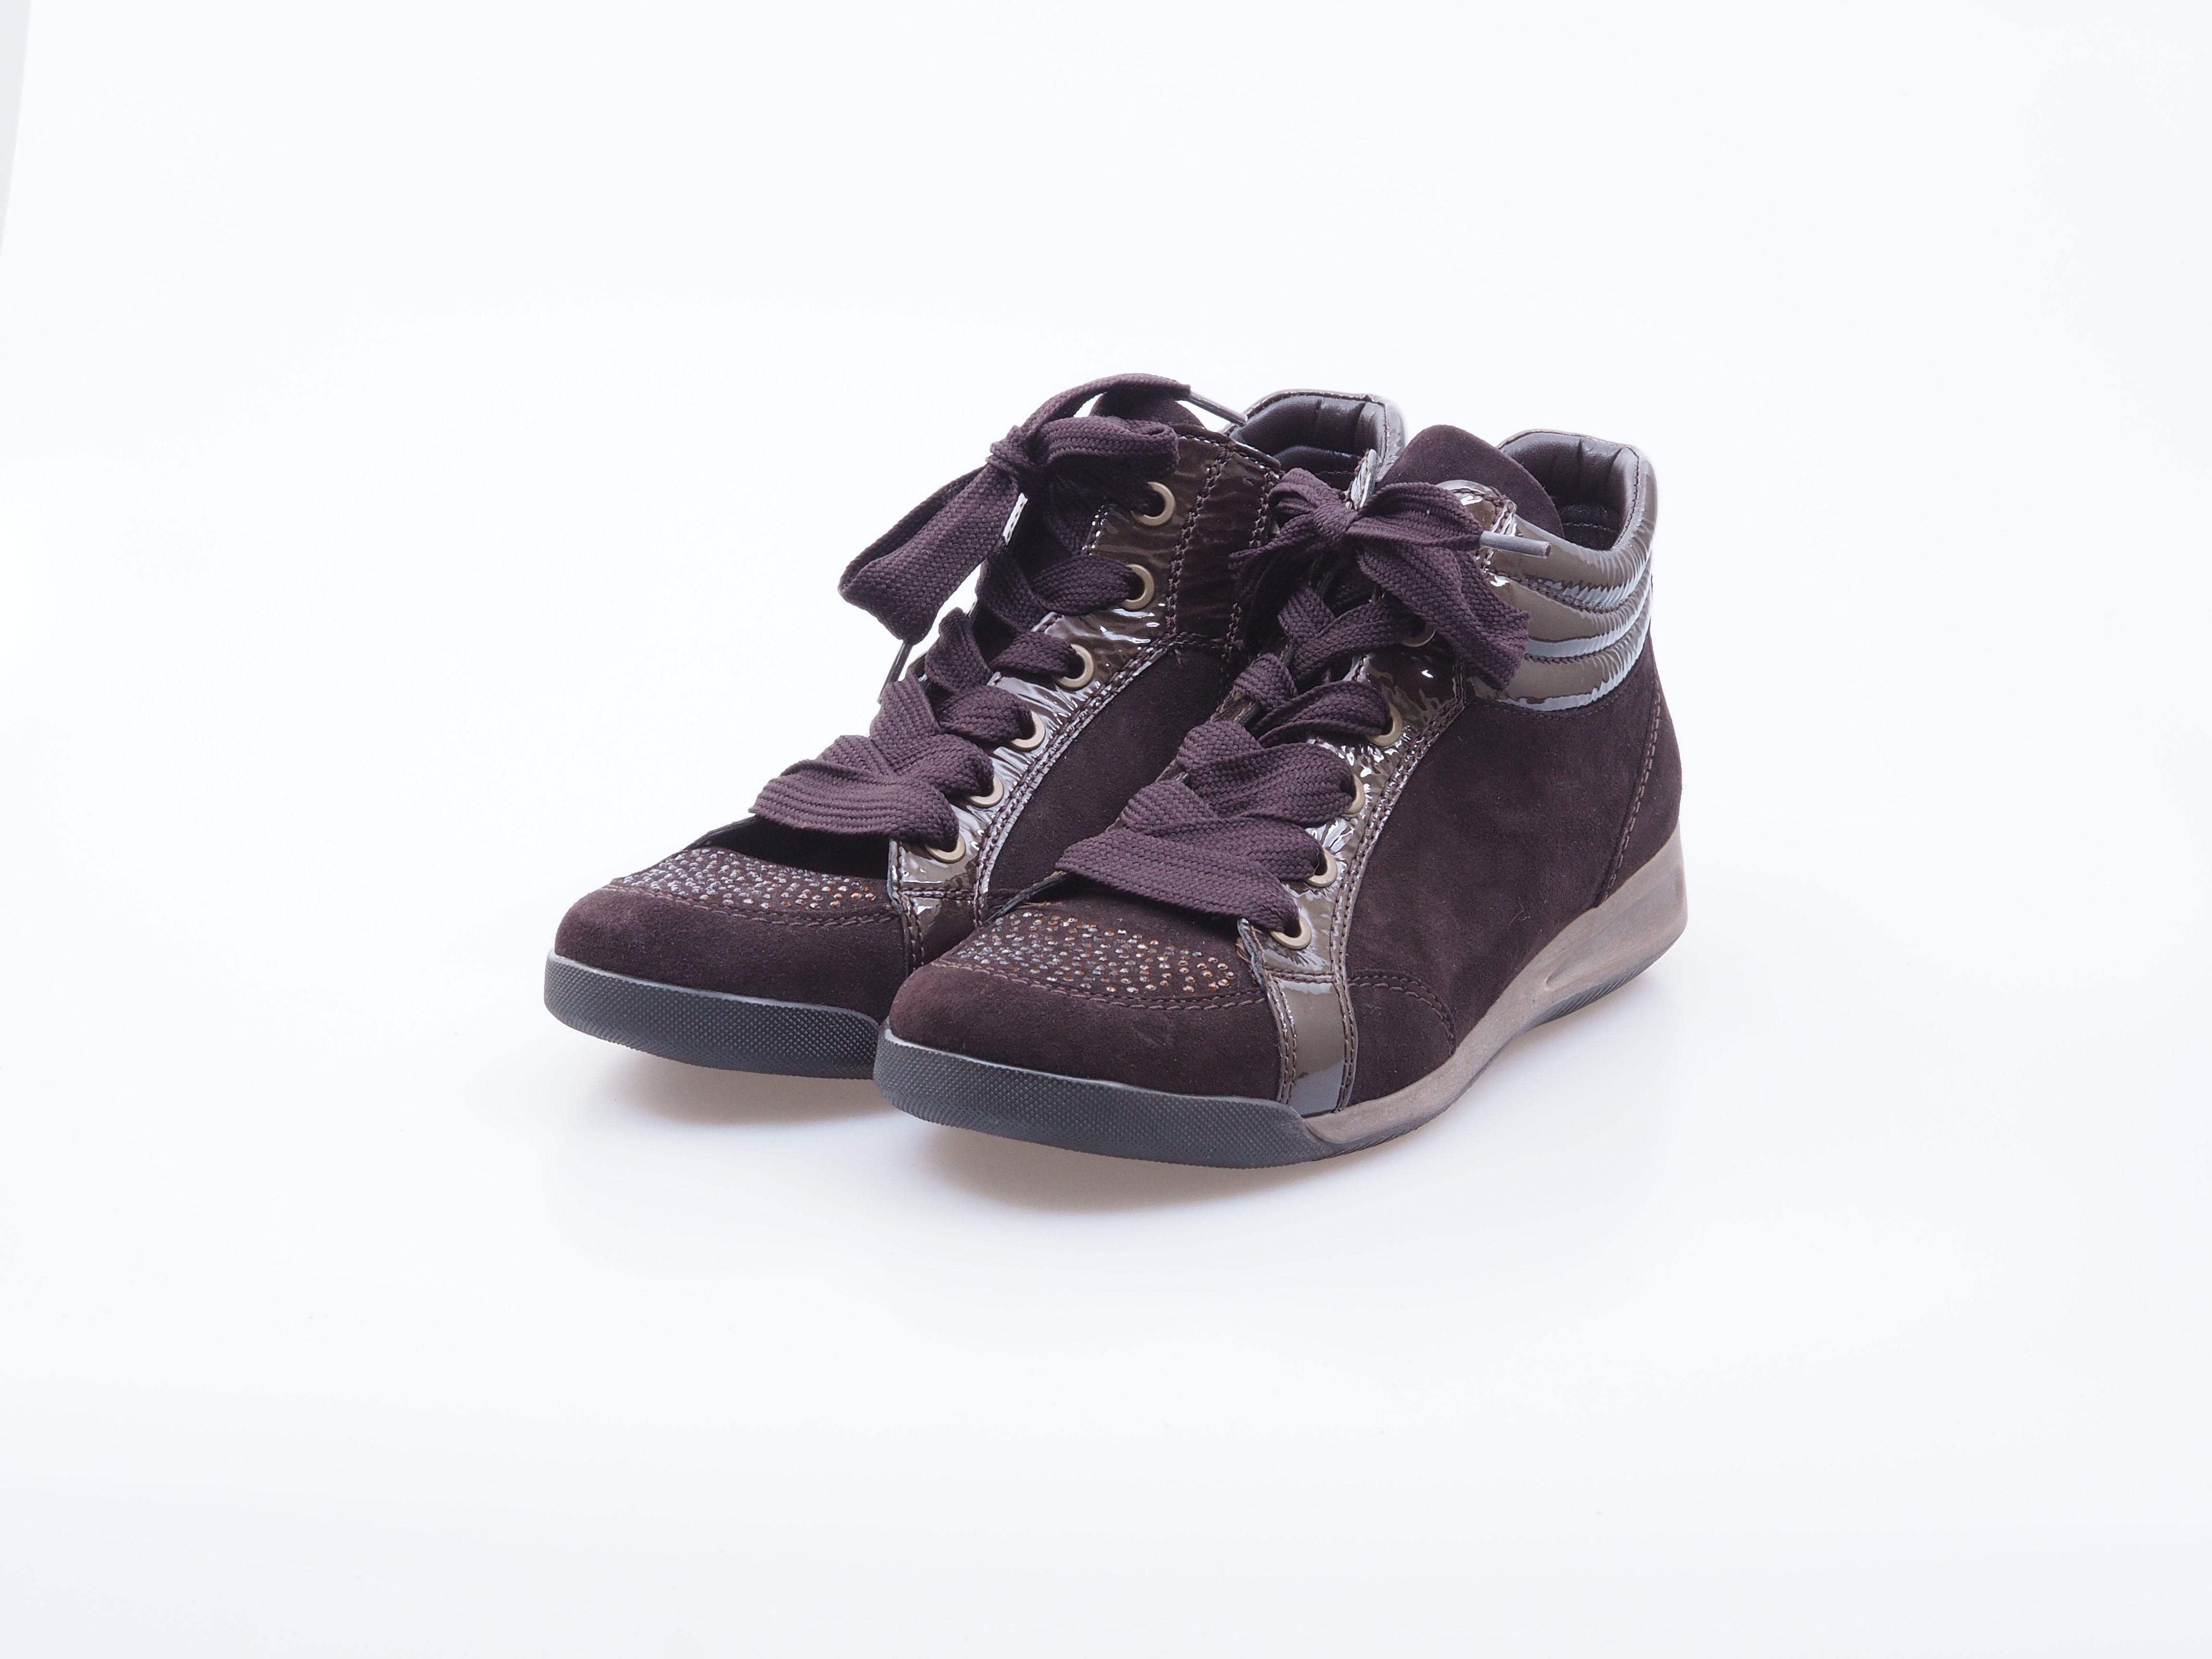 cbf39aa7f46c Soňa - Dámska obuv - Šnurovacia obuv - Dámska šnurovacia obuv